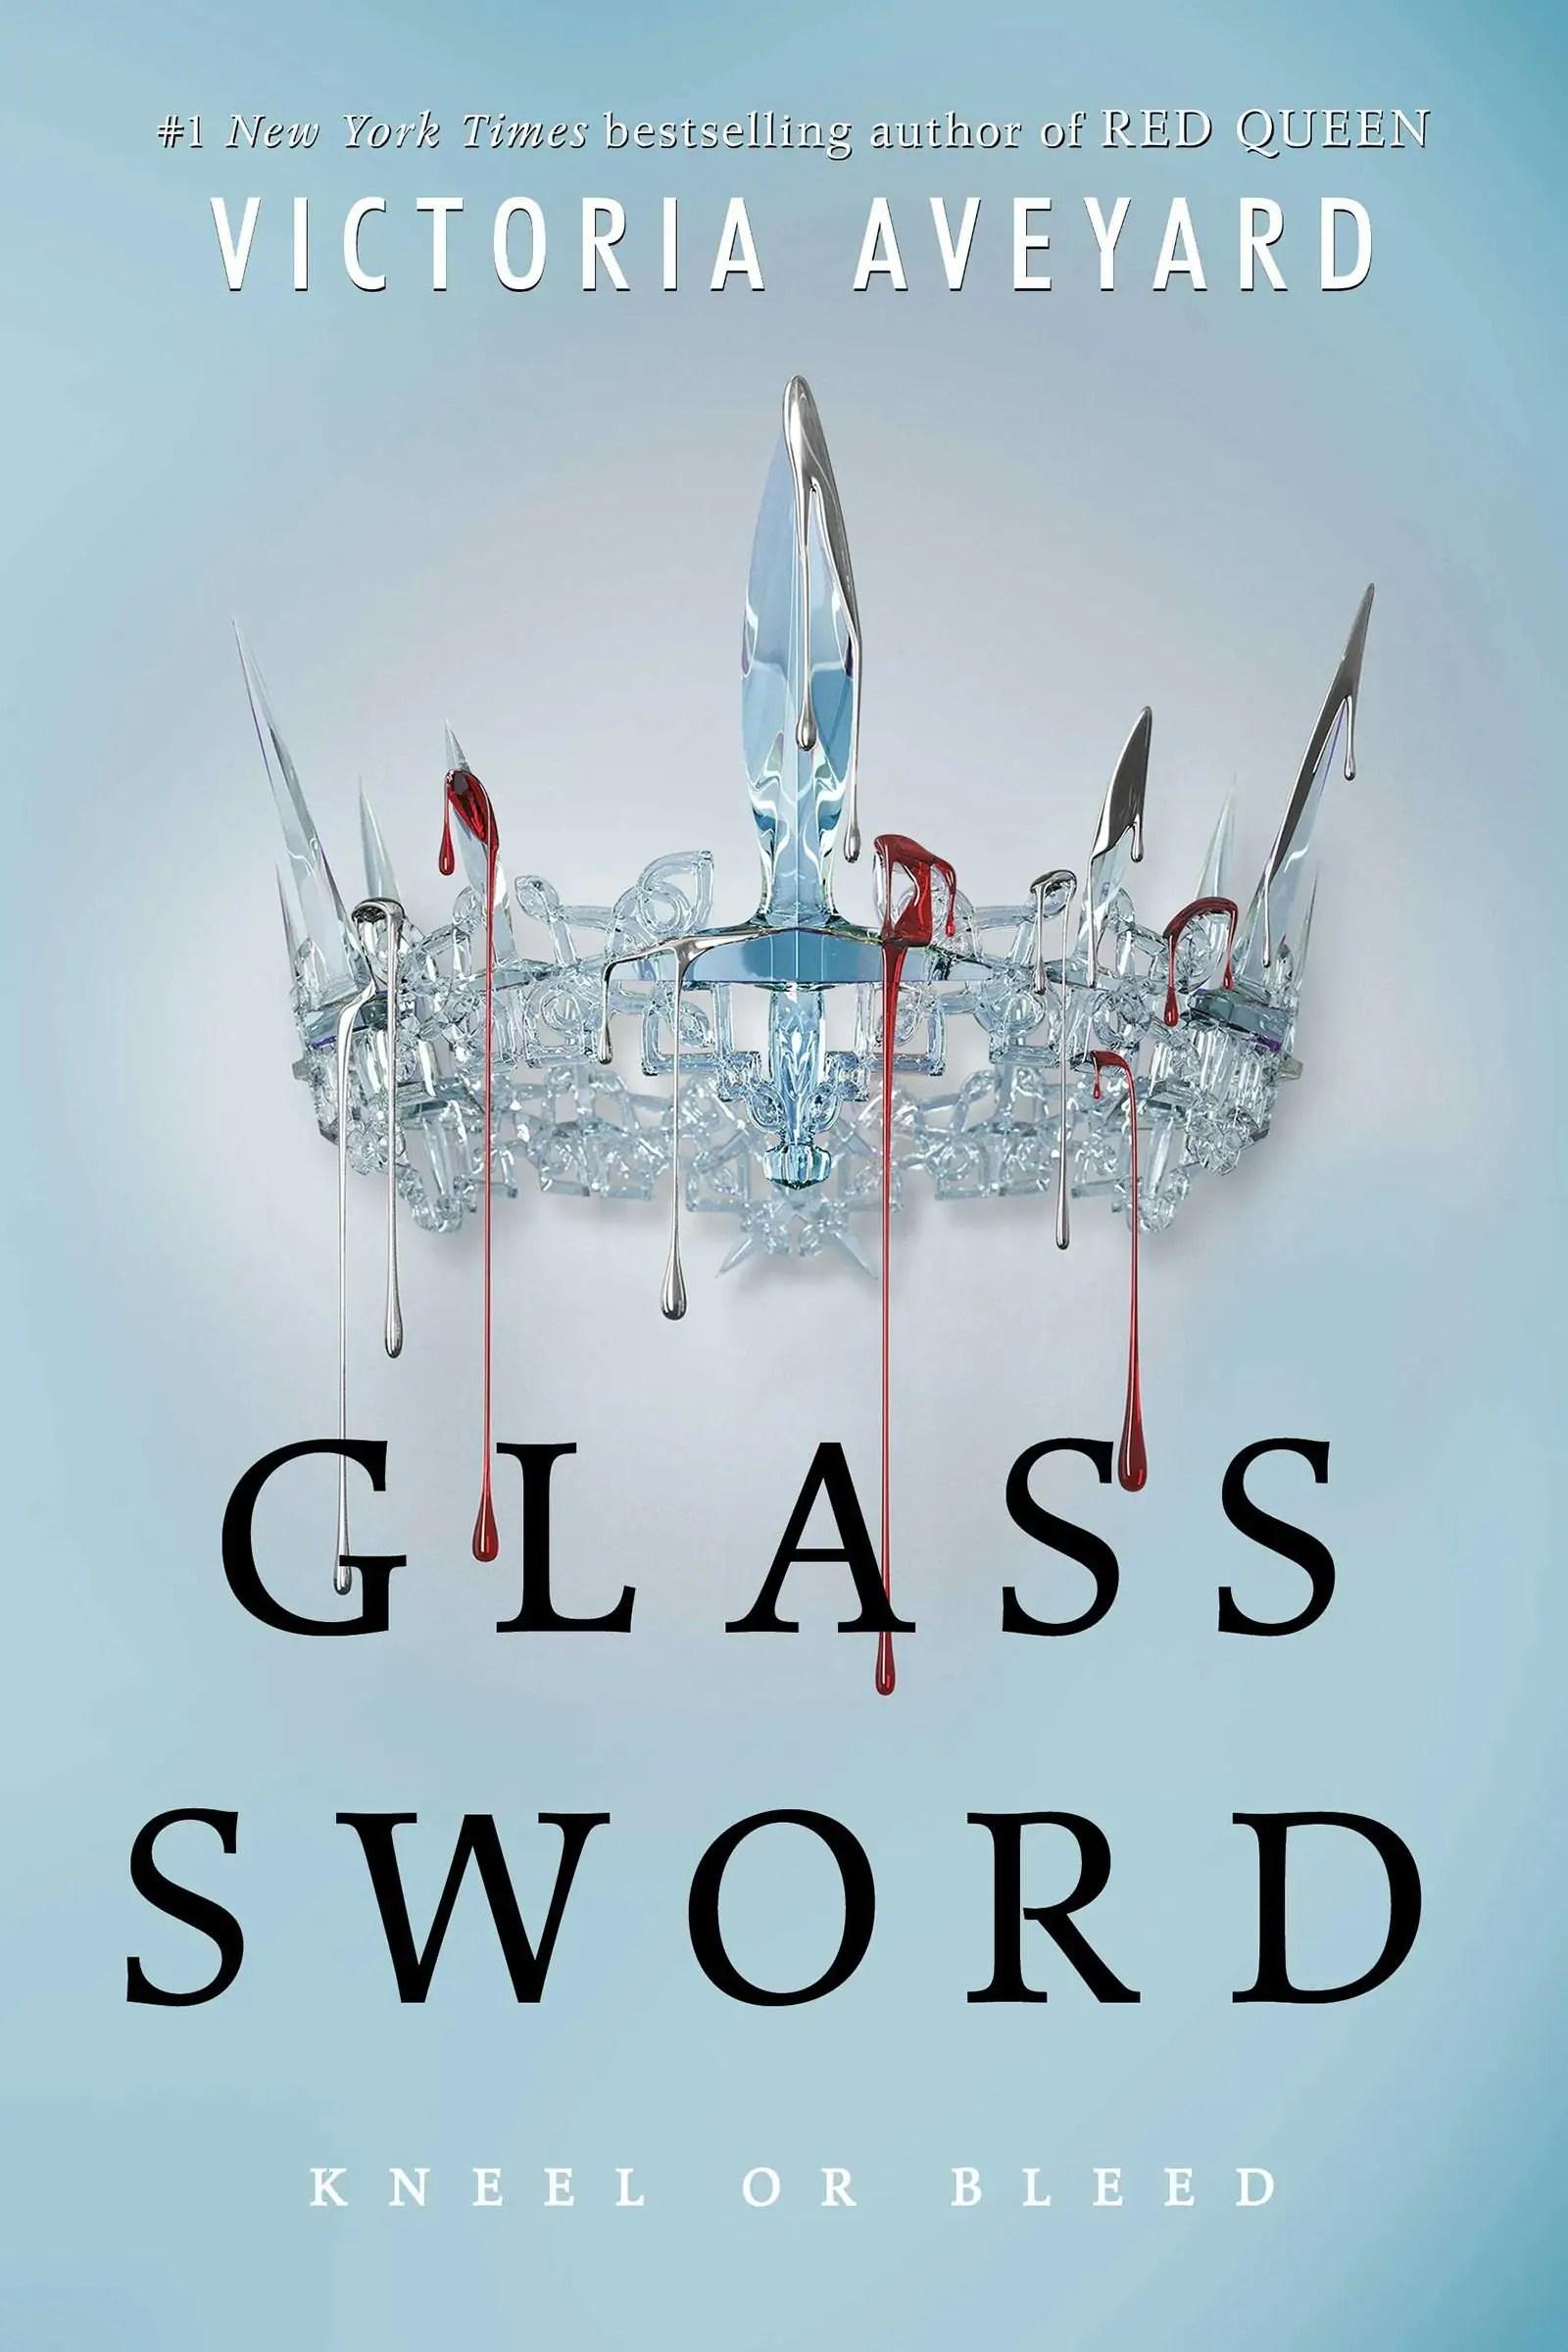 Image result for glass sword